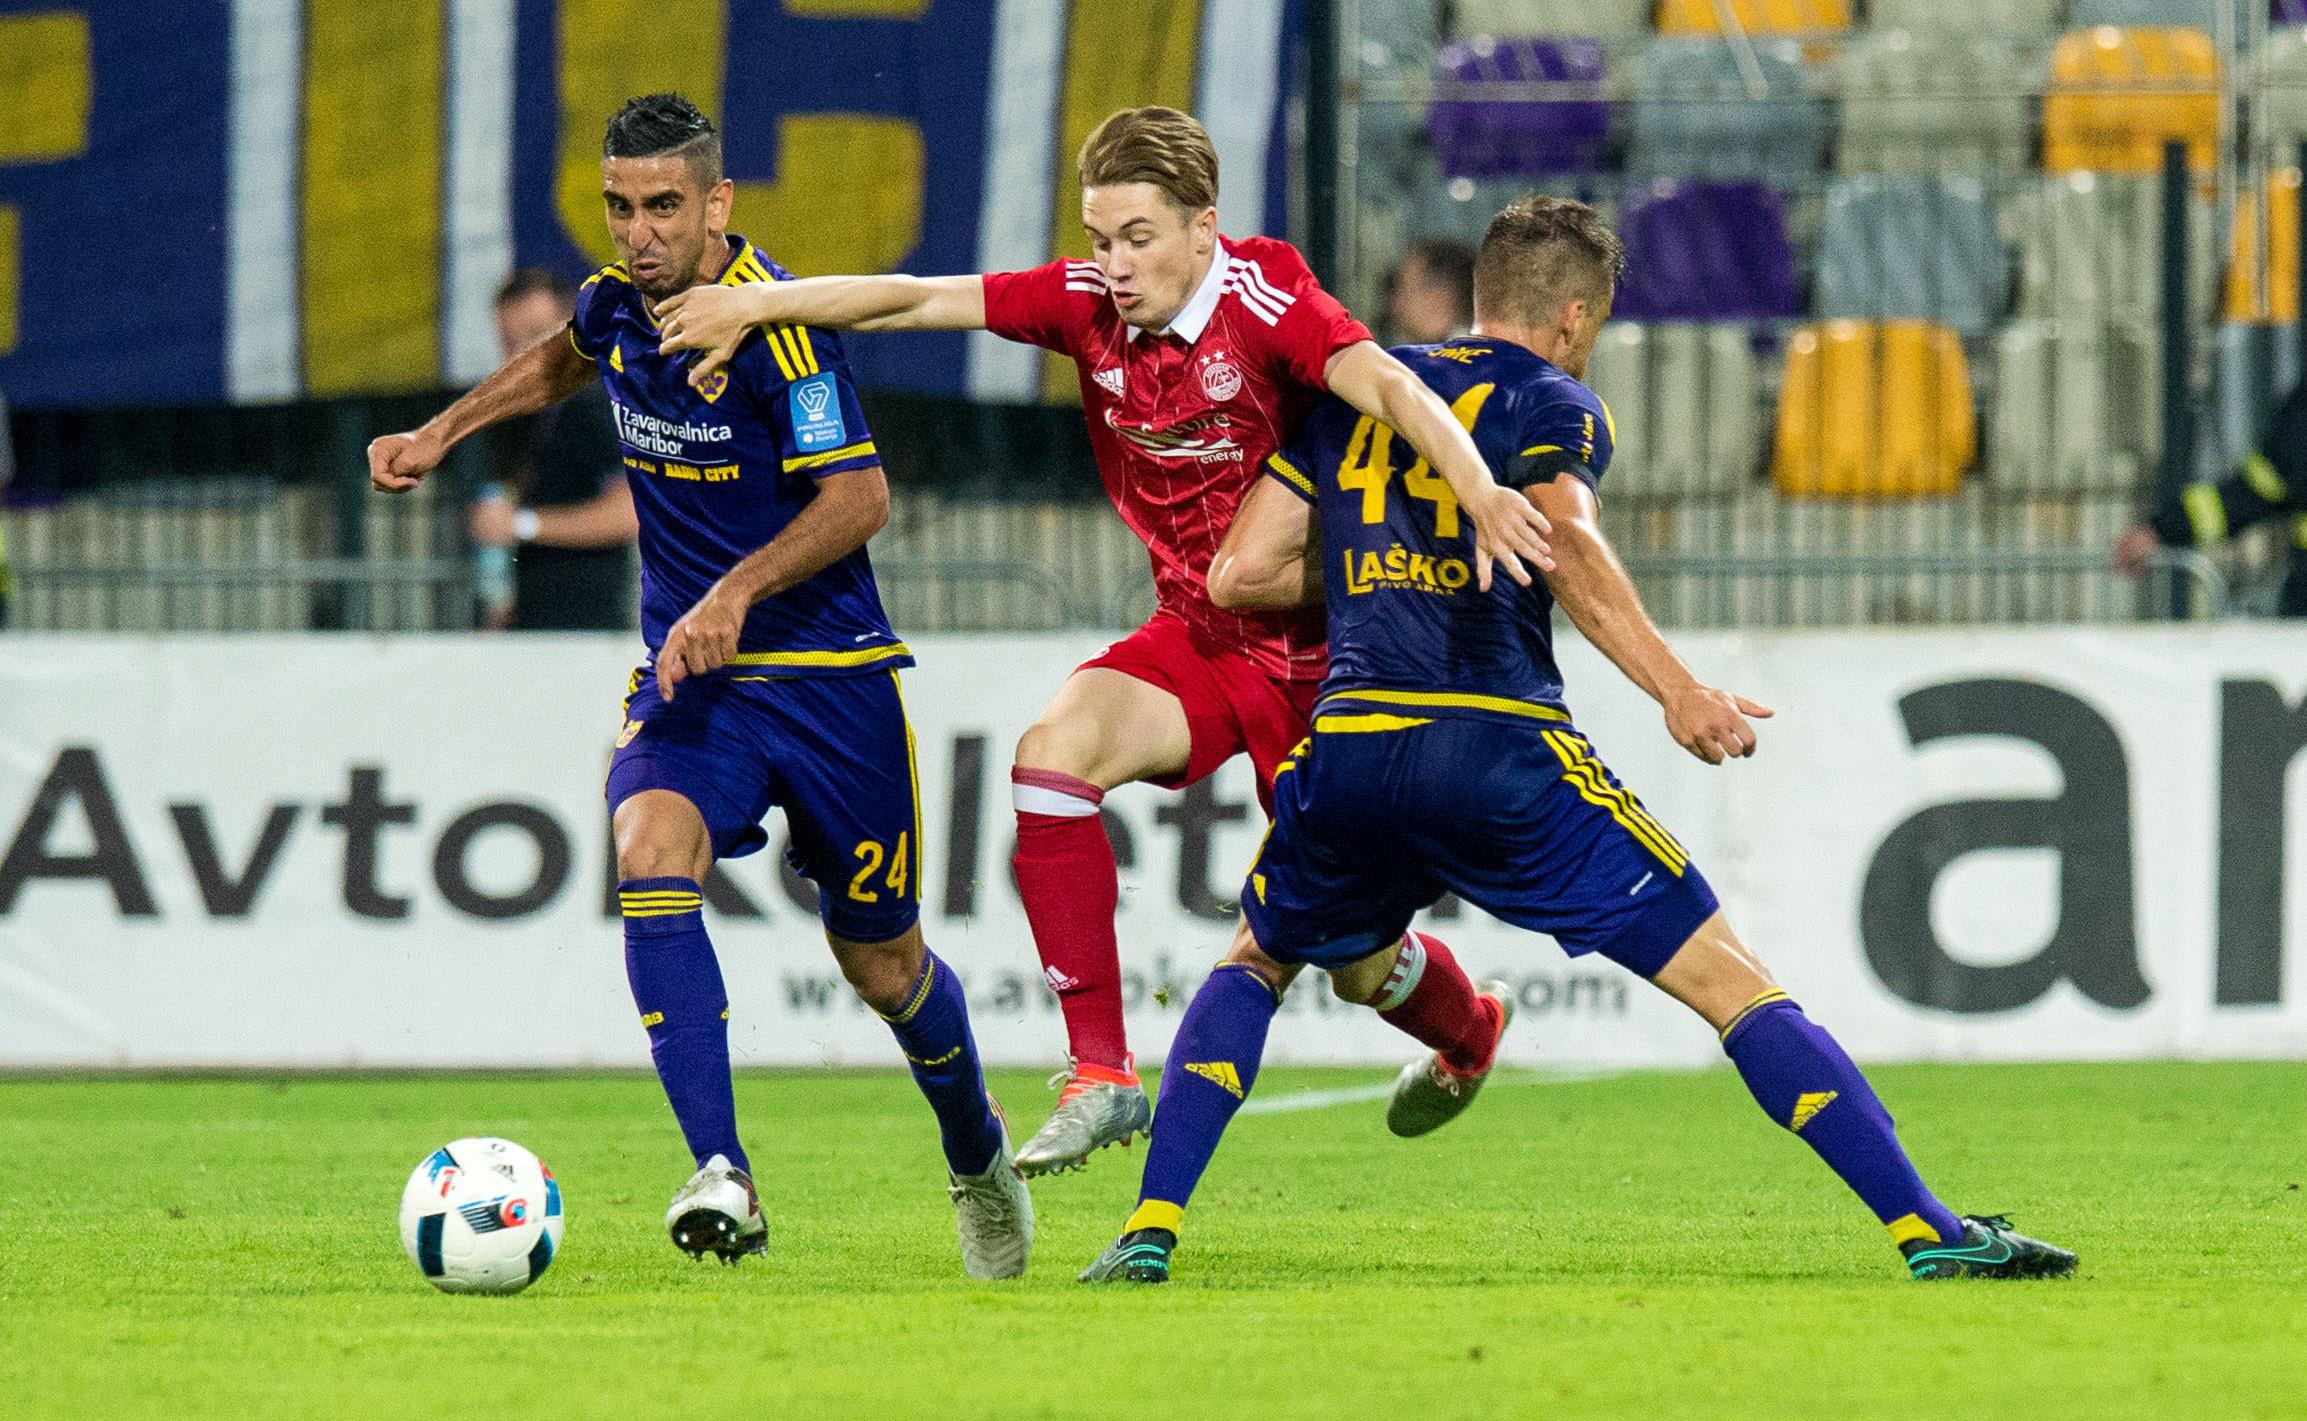 Scott Wright, centre, battles against Maribor earlier this season.